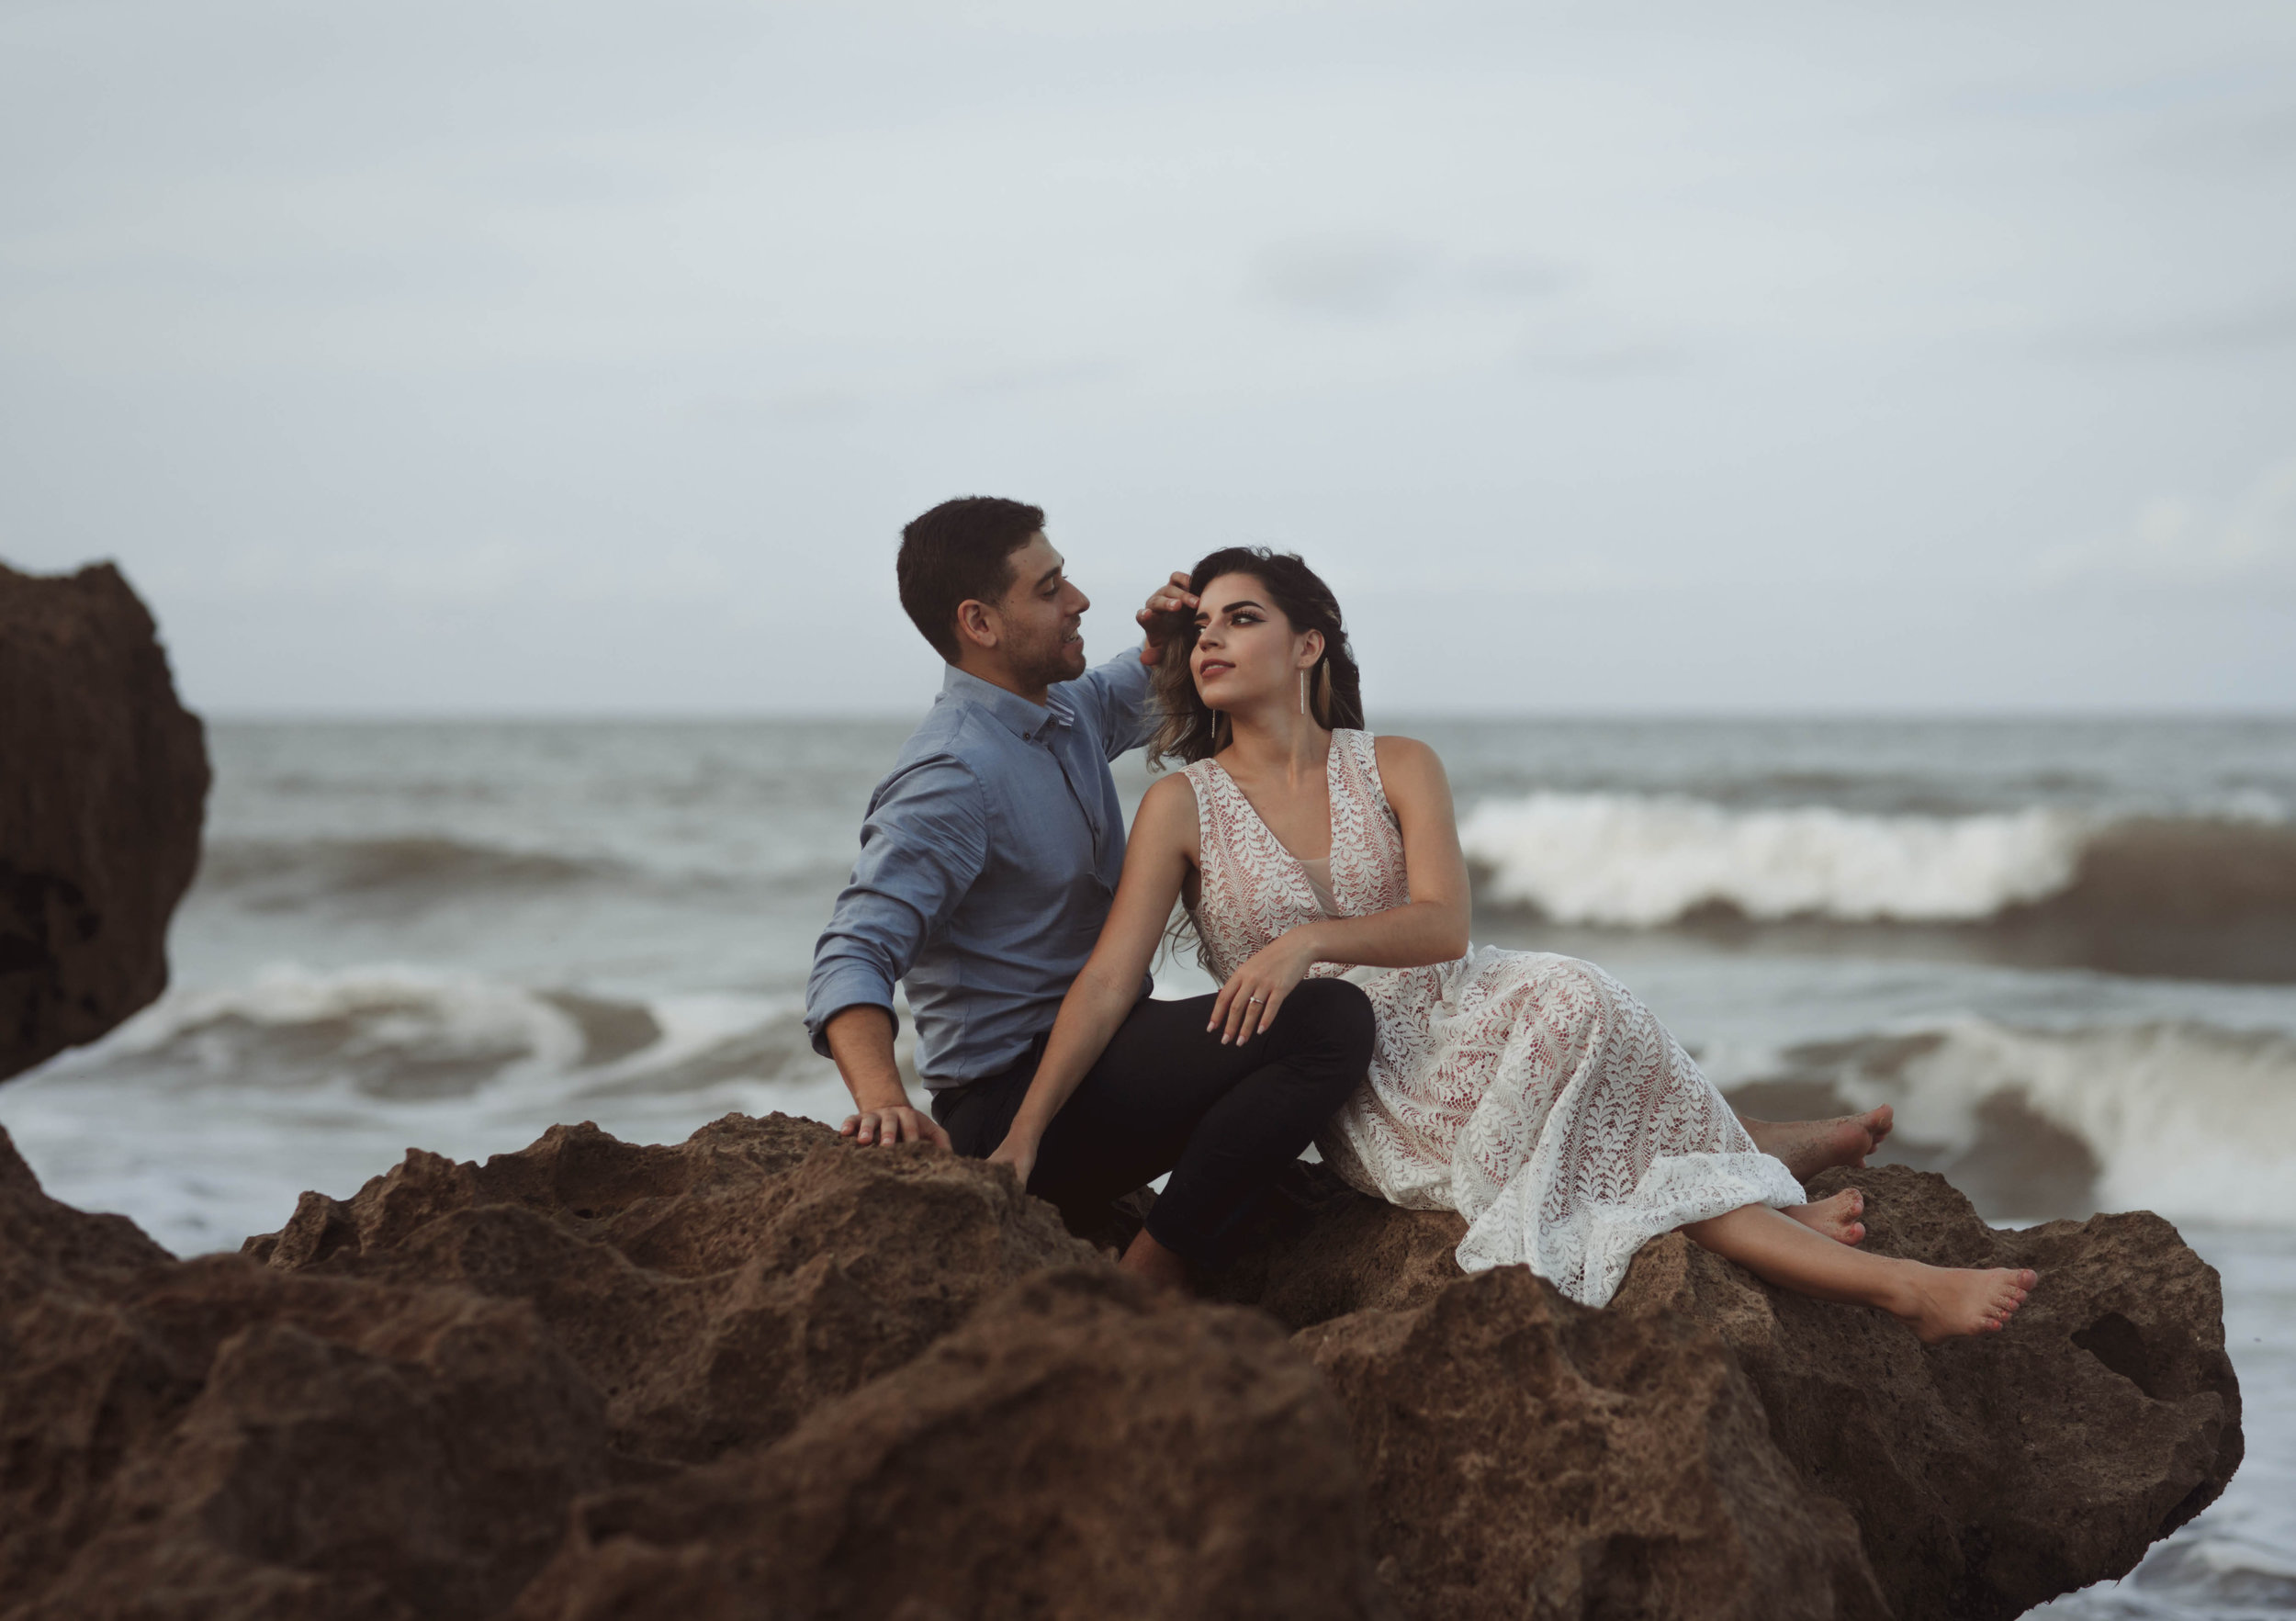 Engagement Session | Kiara Marie and Calixto |  © Vanessa Boy | vanessaboy.com-243.jpg